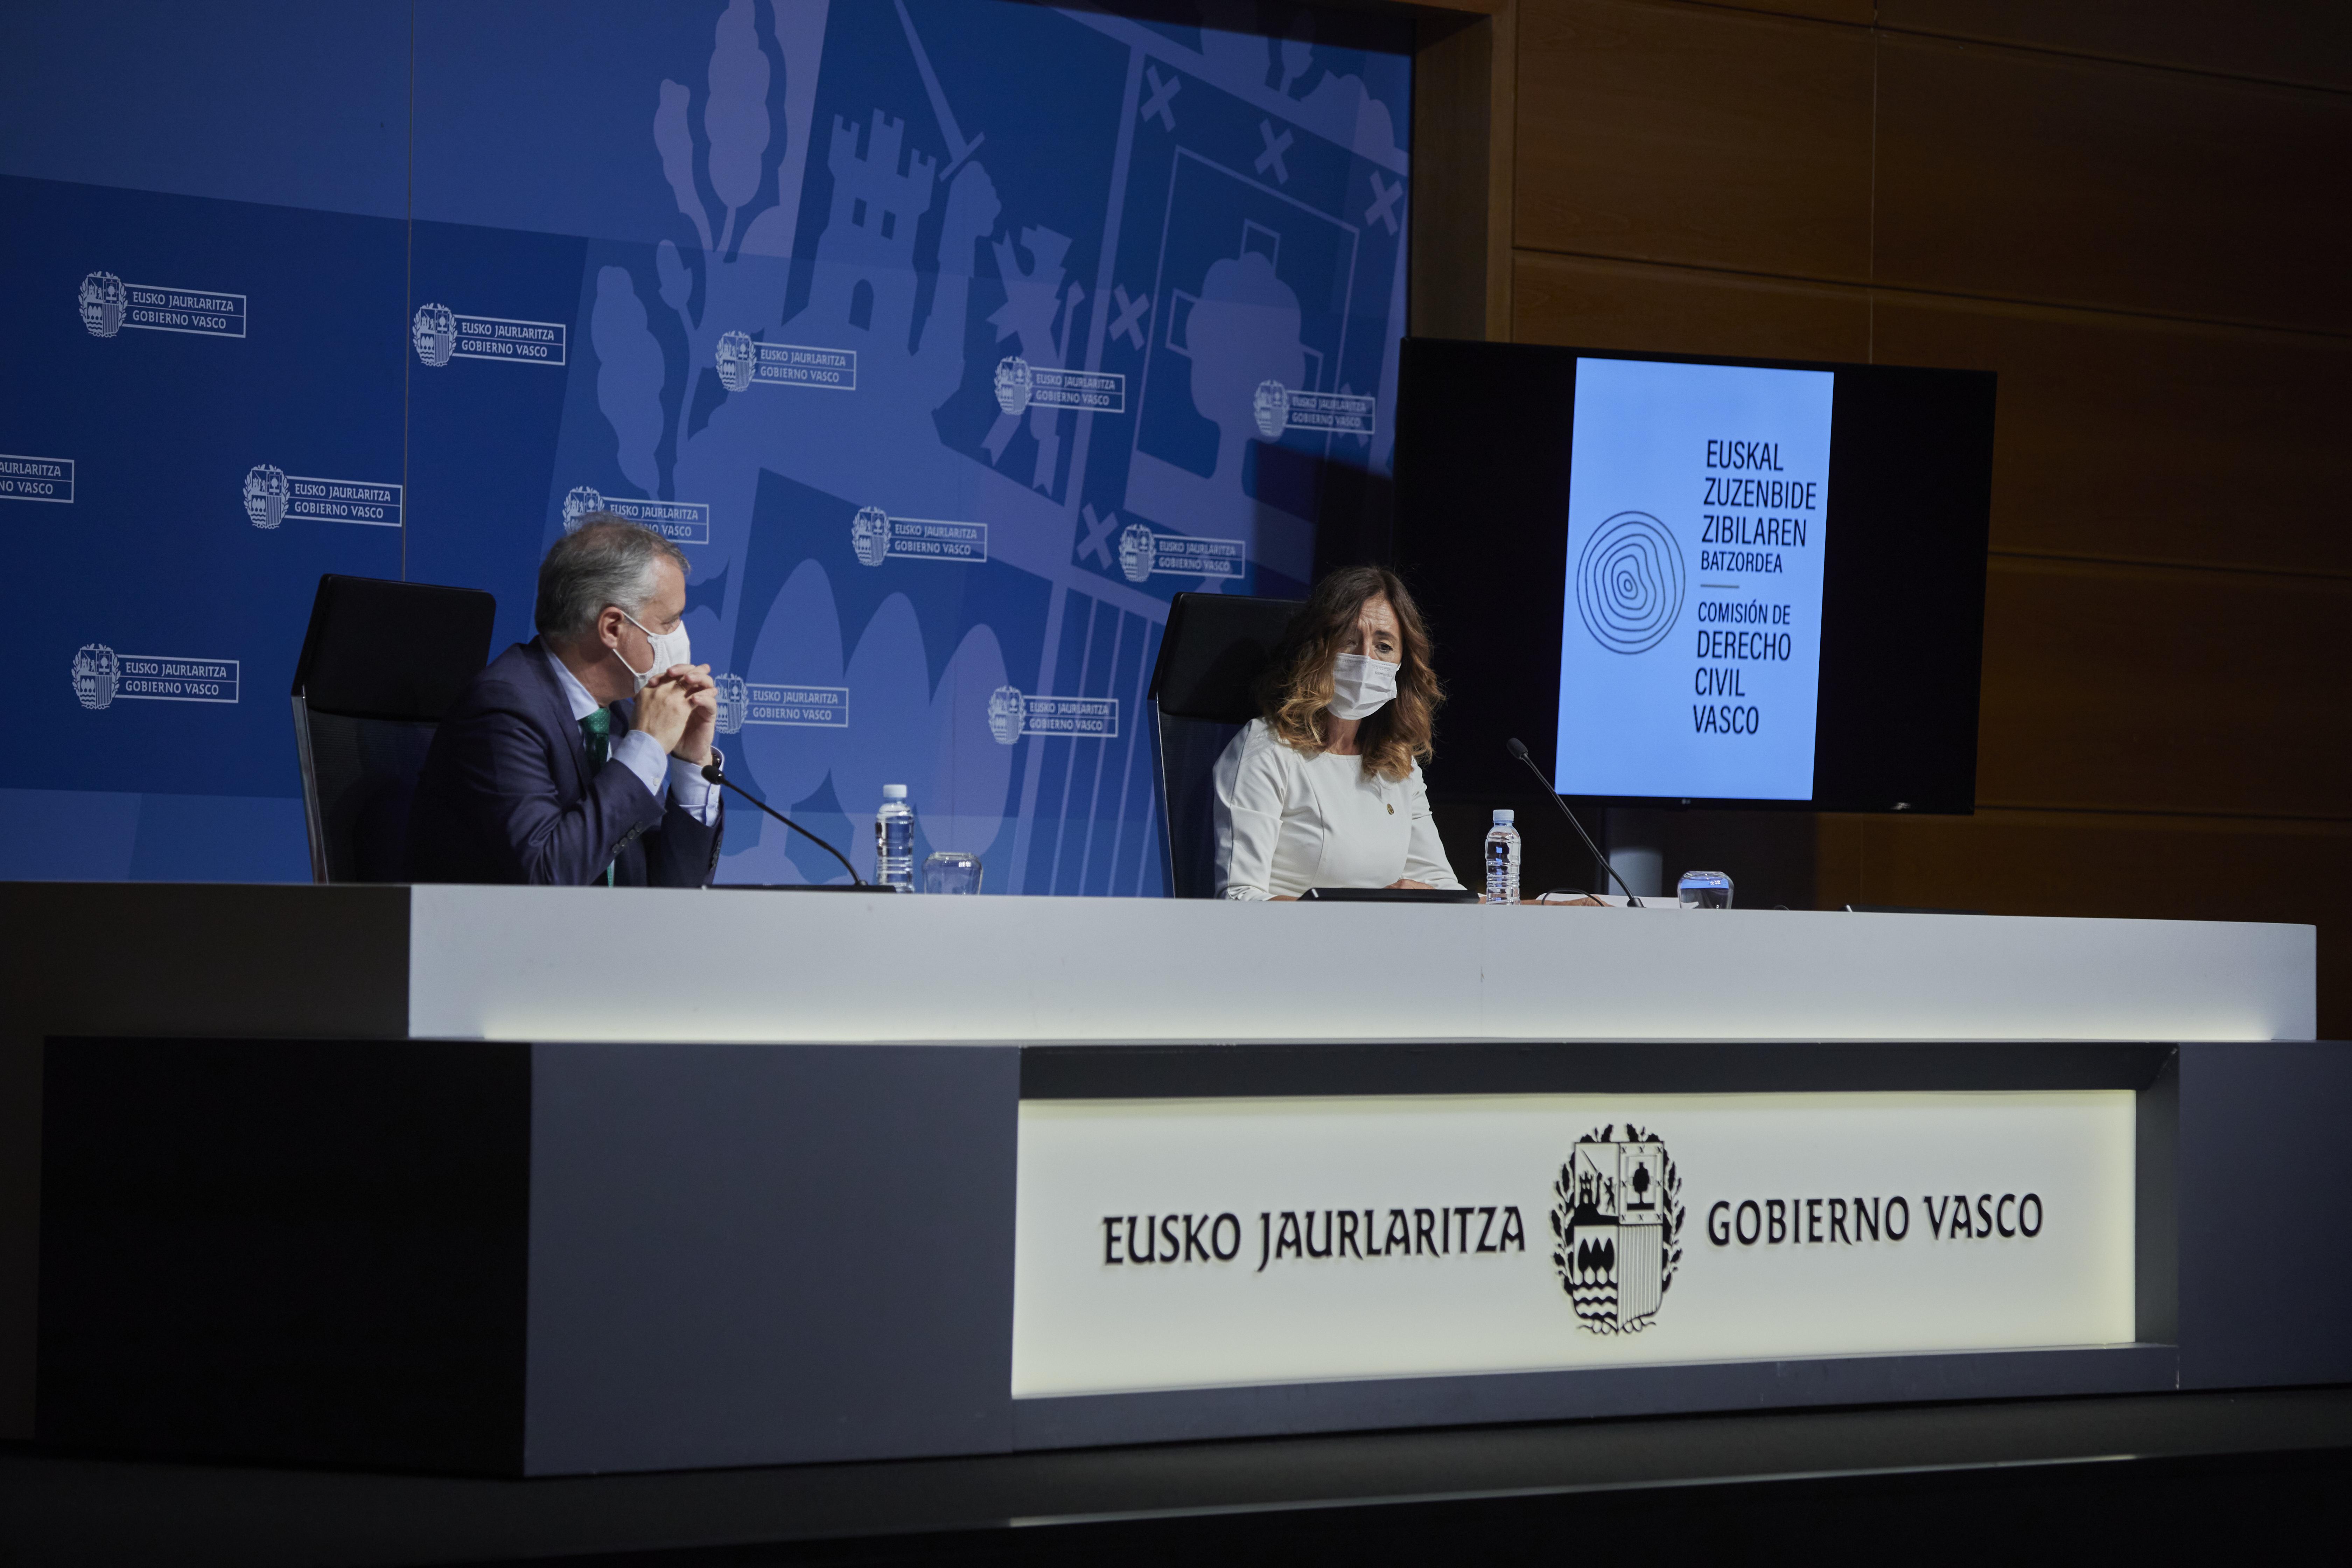 2021.06.29_Comision_de_Derecho_Civil_Vasco_054.jpg